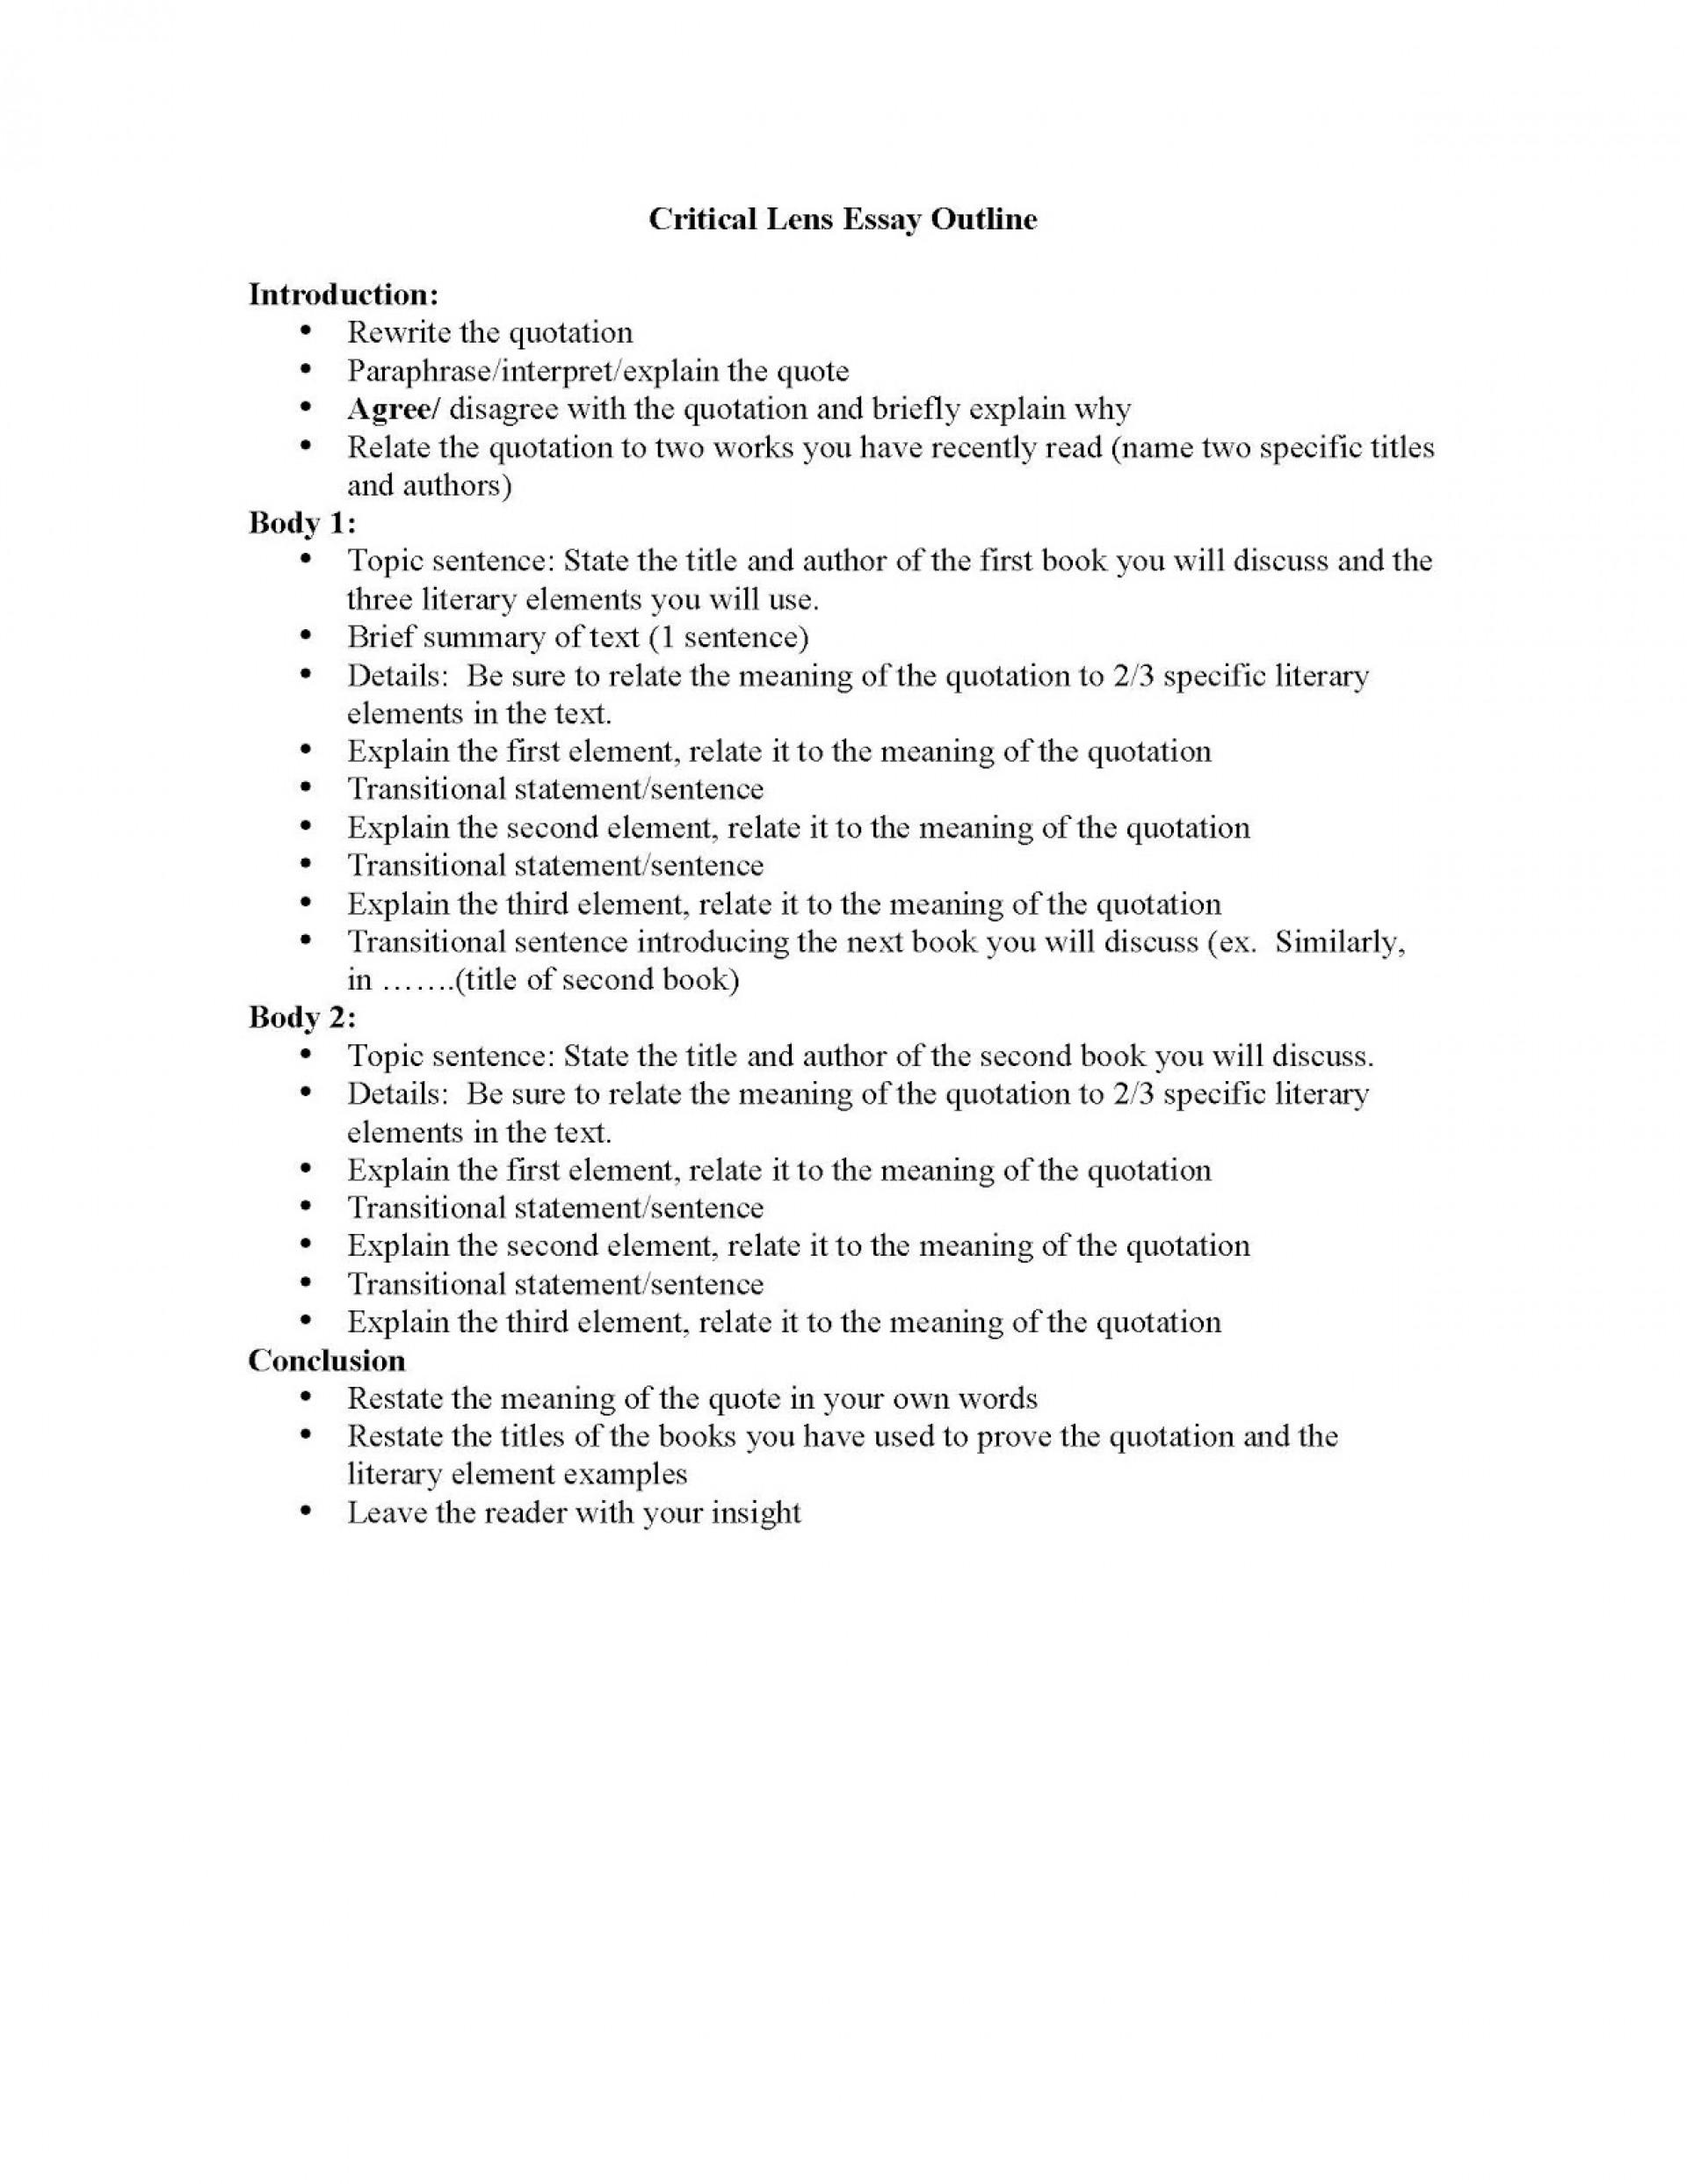 001 Essay Example Outline Of An Criticallensessayoutlineandliterayelements Page 1 Sensational Argumentative Sample Co Education Pdf 1920